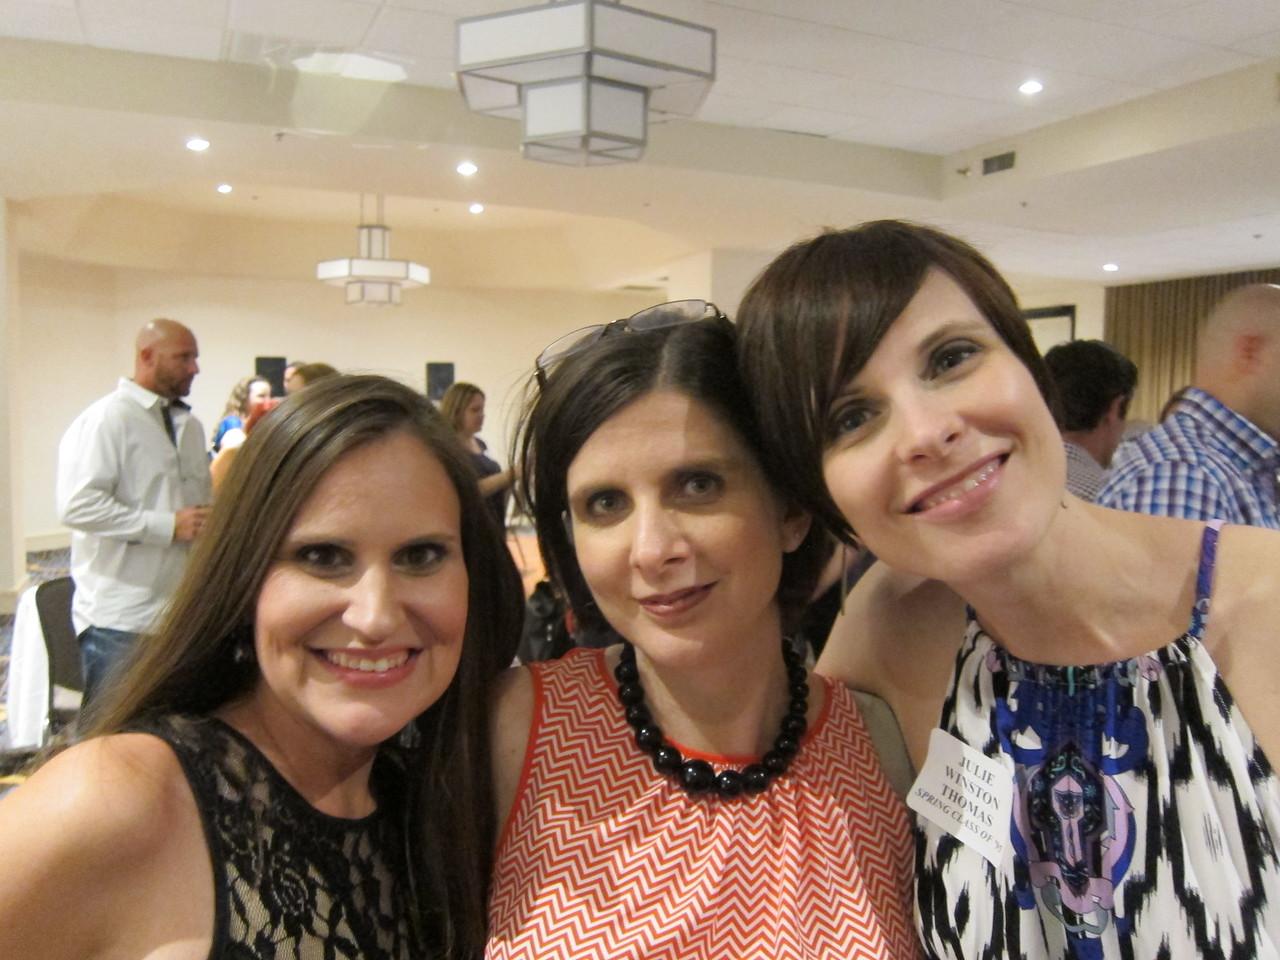 Susan, Danielle and I